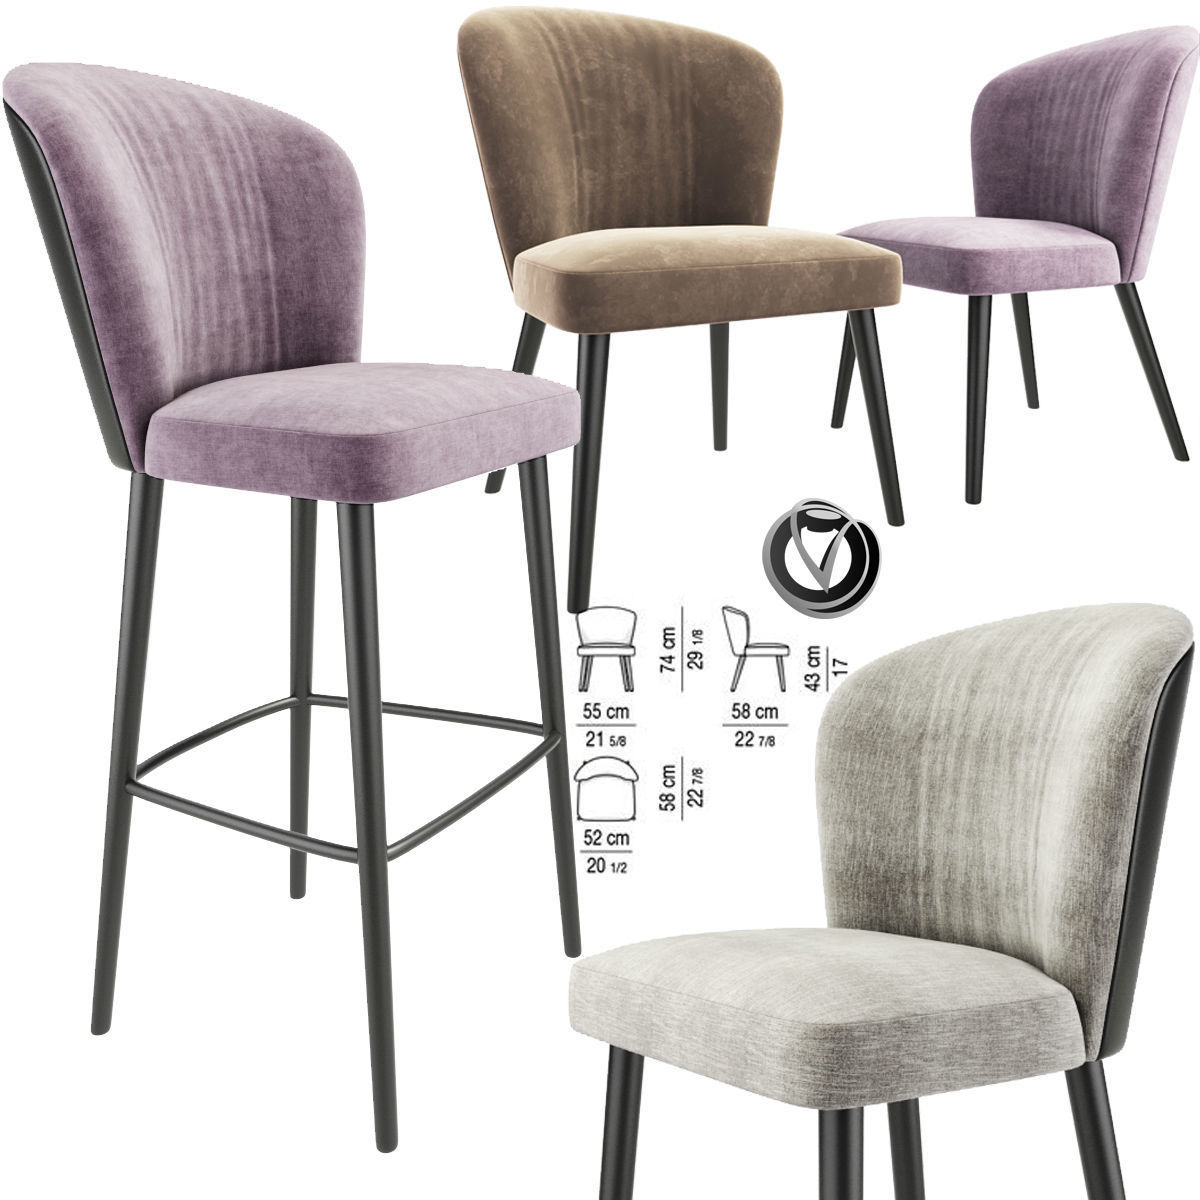 Pleasant Minotti Aston Bar Stool And Lounge Chair 3D Model Camellatalisay Diy Chair Ideas Camellatalisaycom